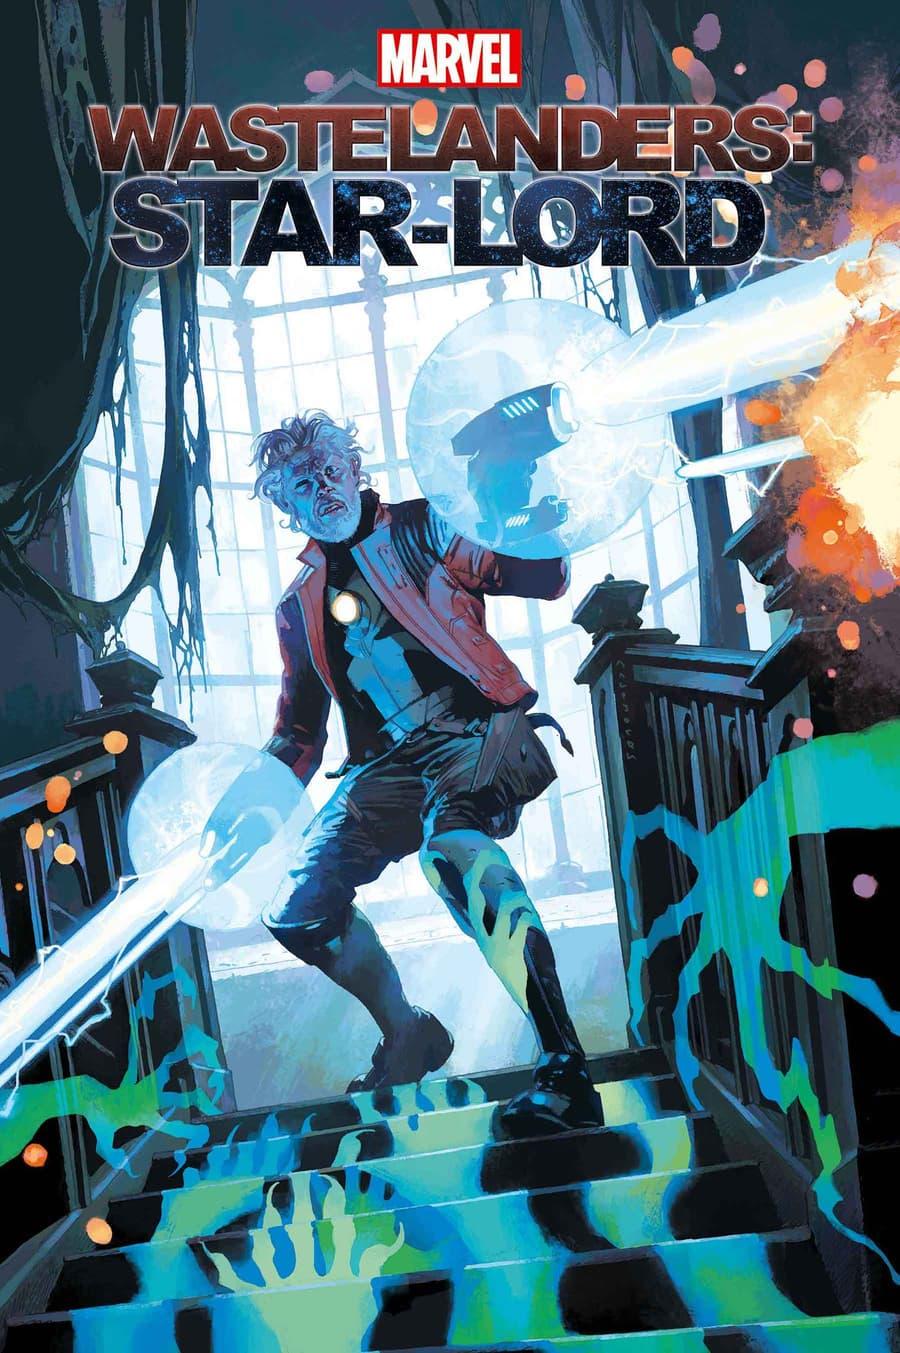 WASTELANDERS: STAR-LORD #1 cover by Josemaria Casanovas